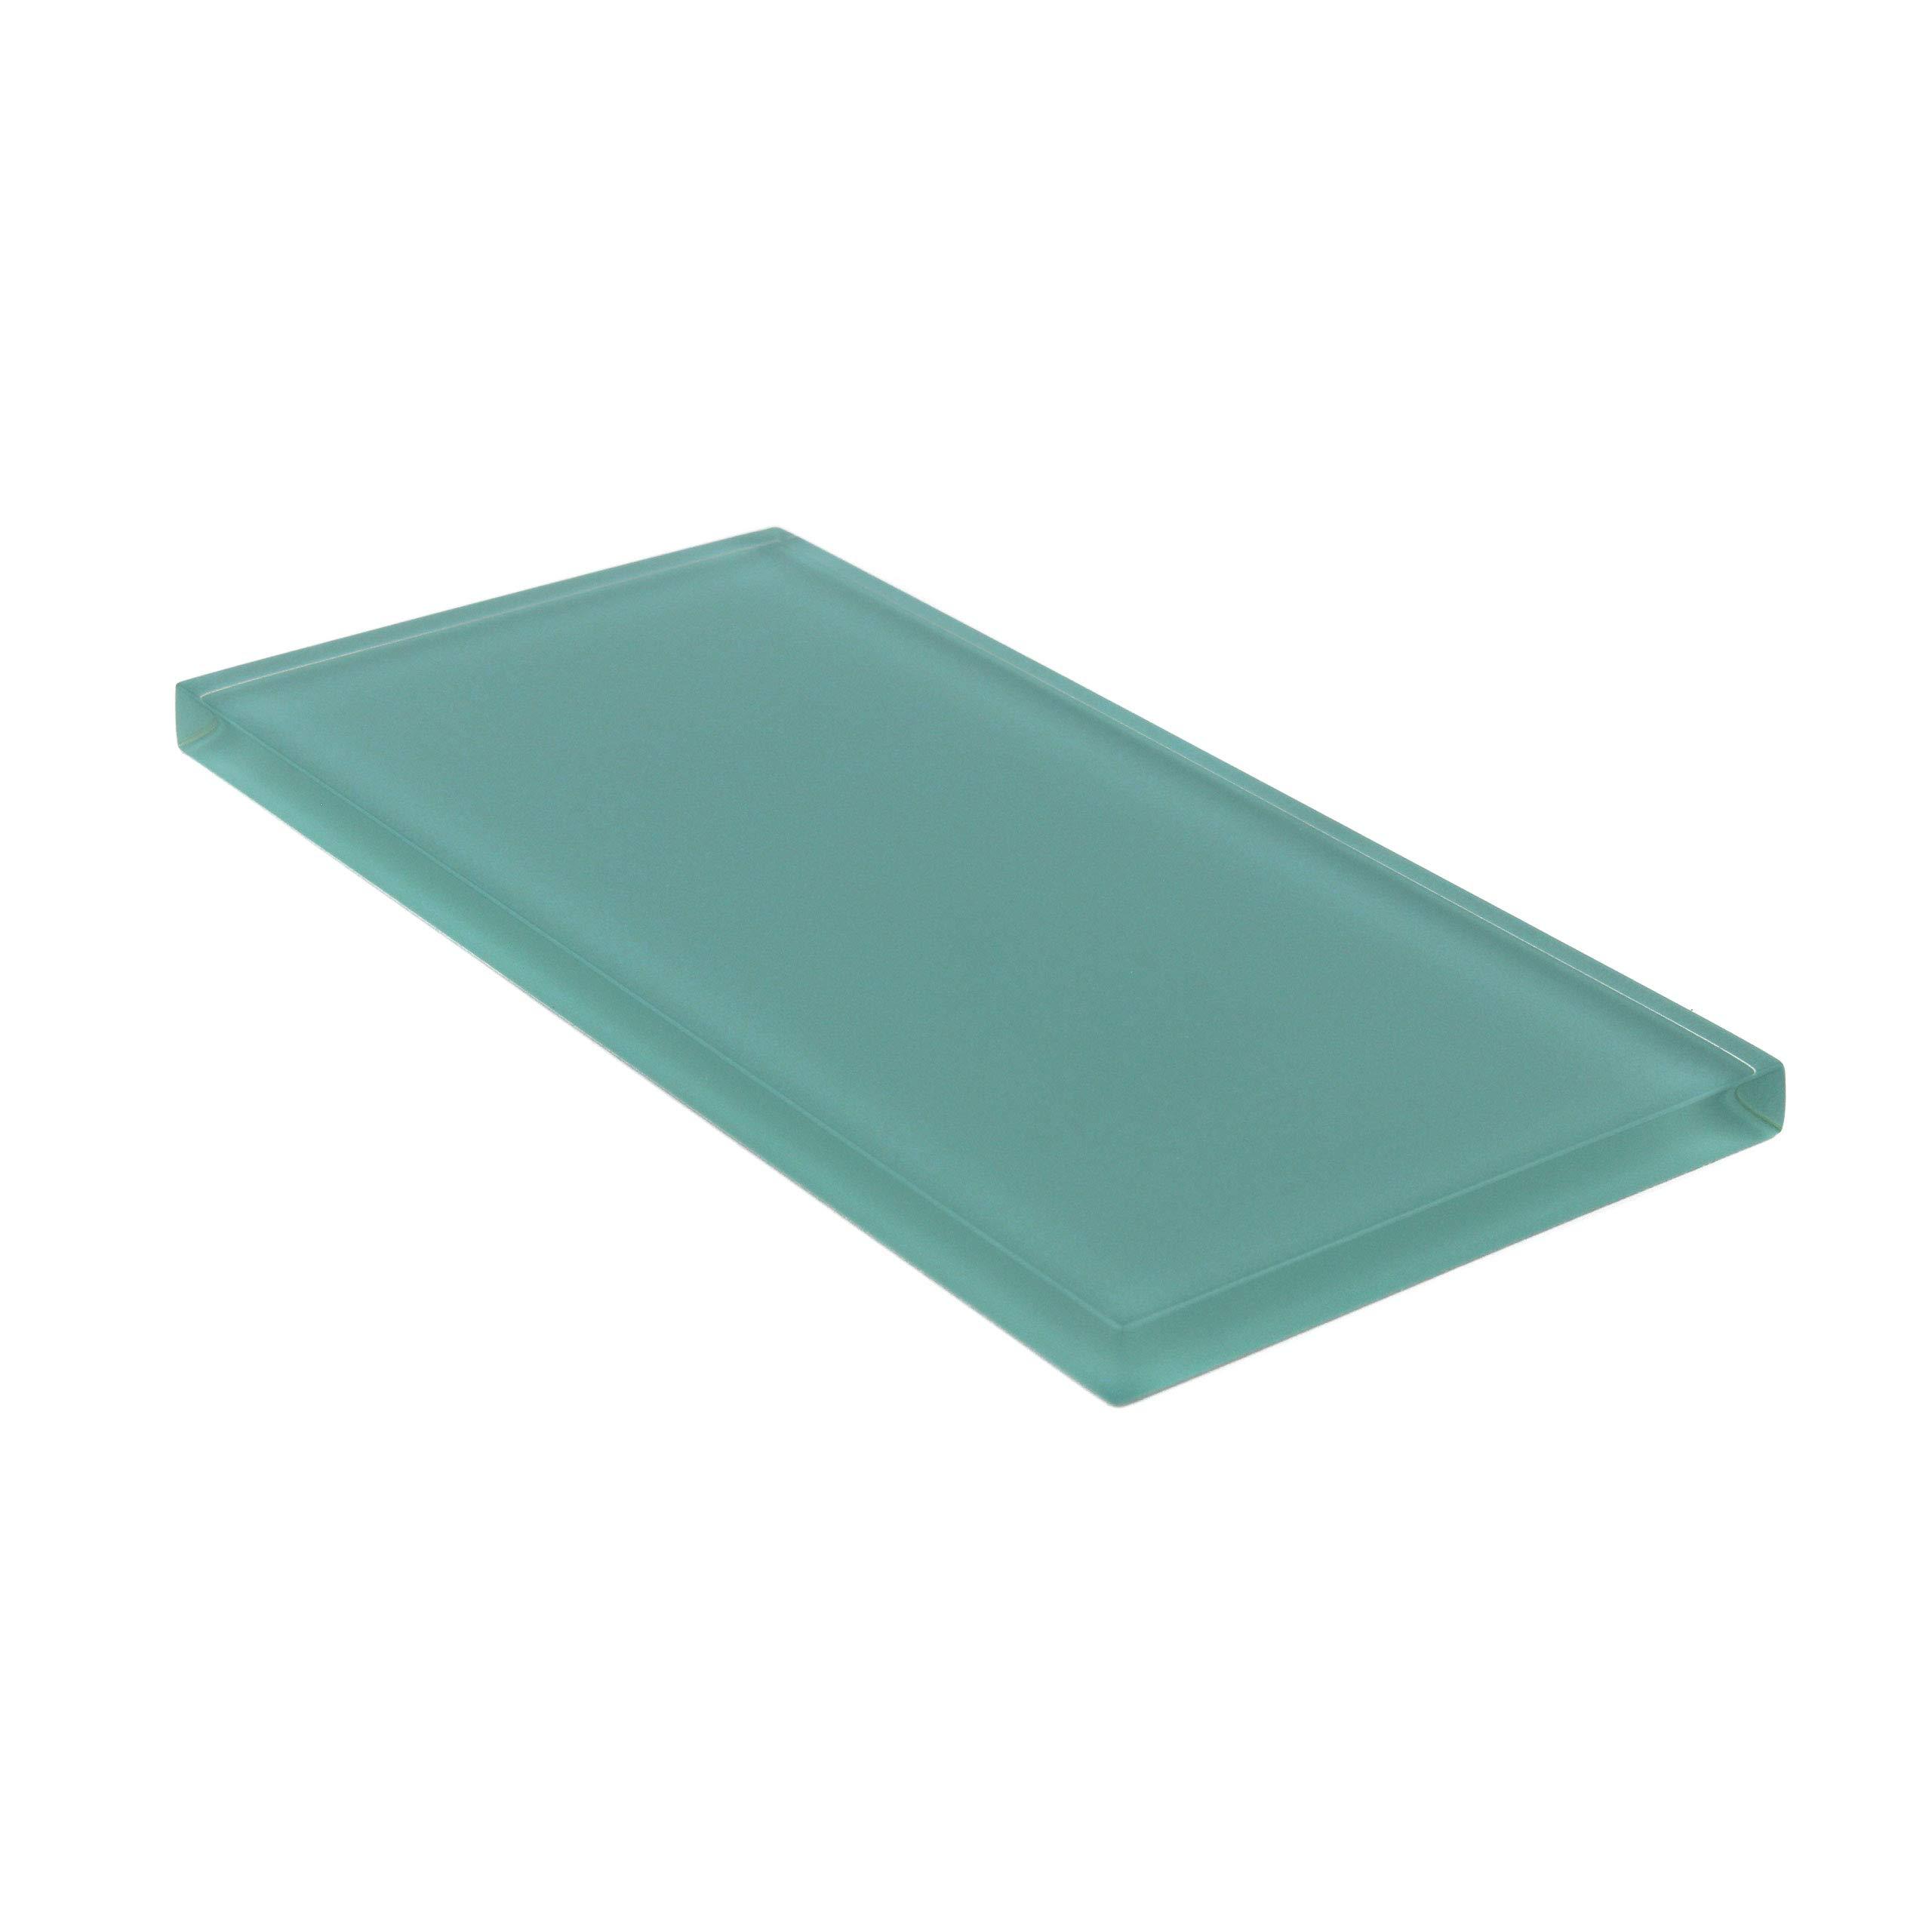 Giorbello Glass Subway Backsplash Tile, 3 x 6, Teal, Sample Tile (1 Piece)